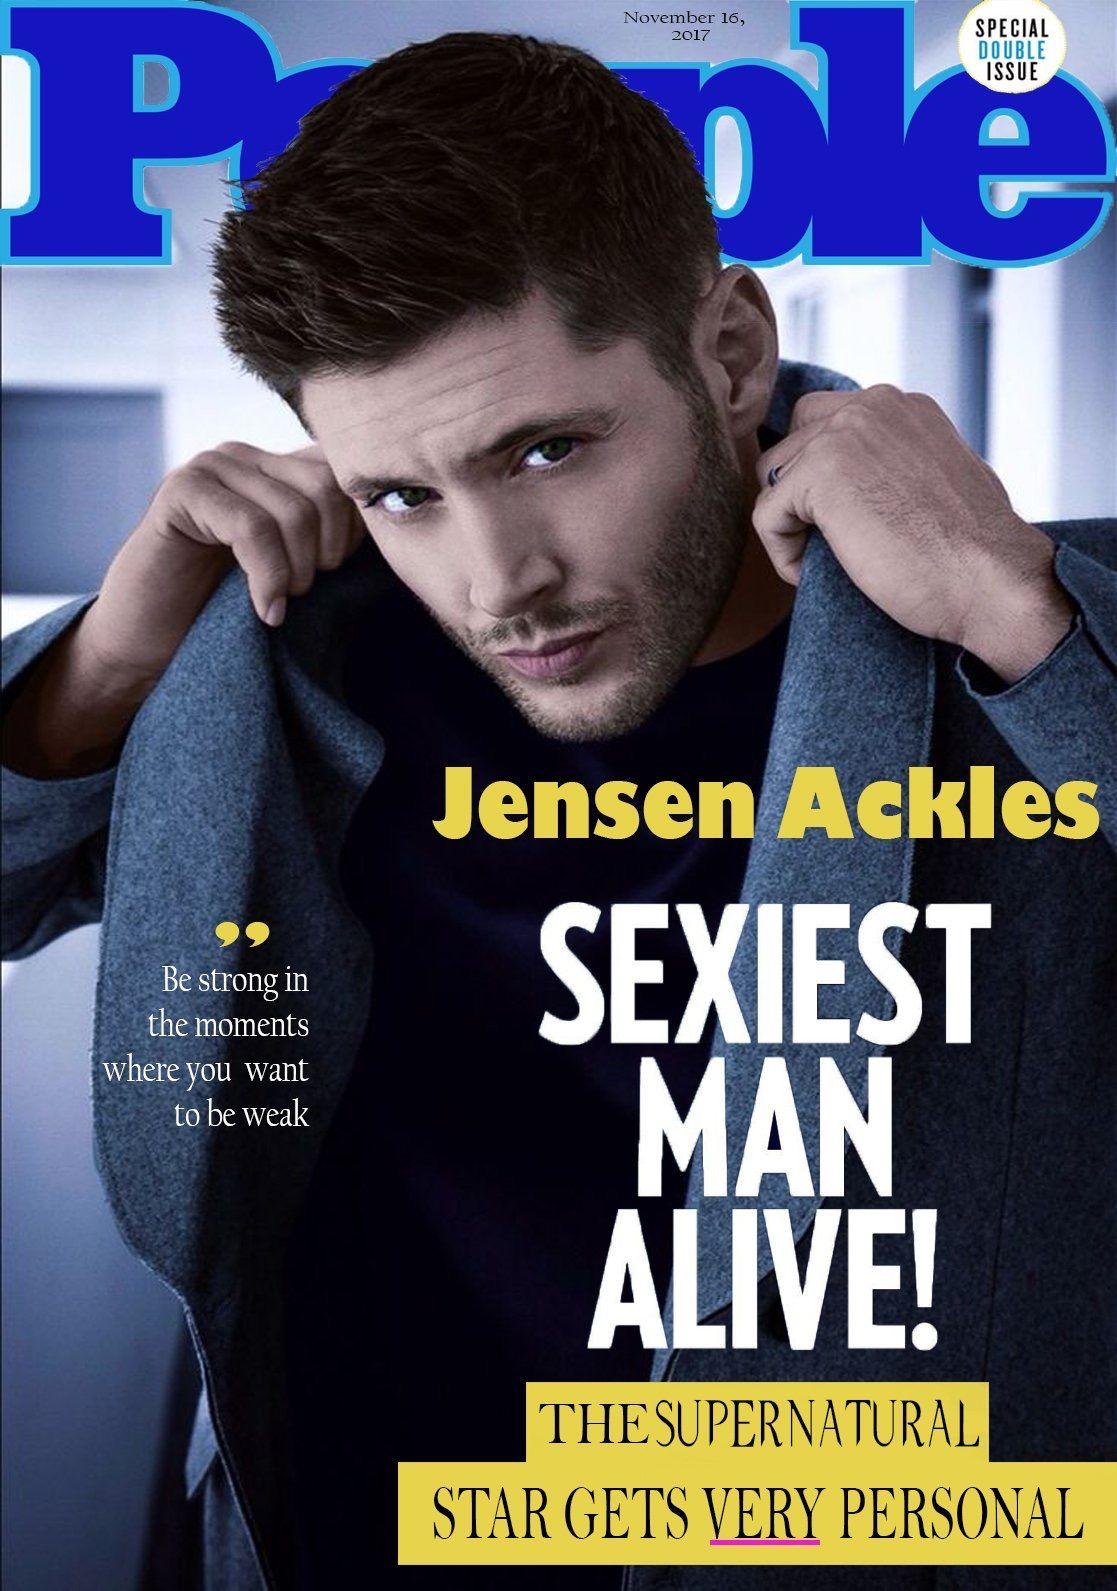 Jensen ackles gerade porno foto 2